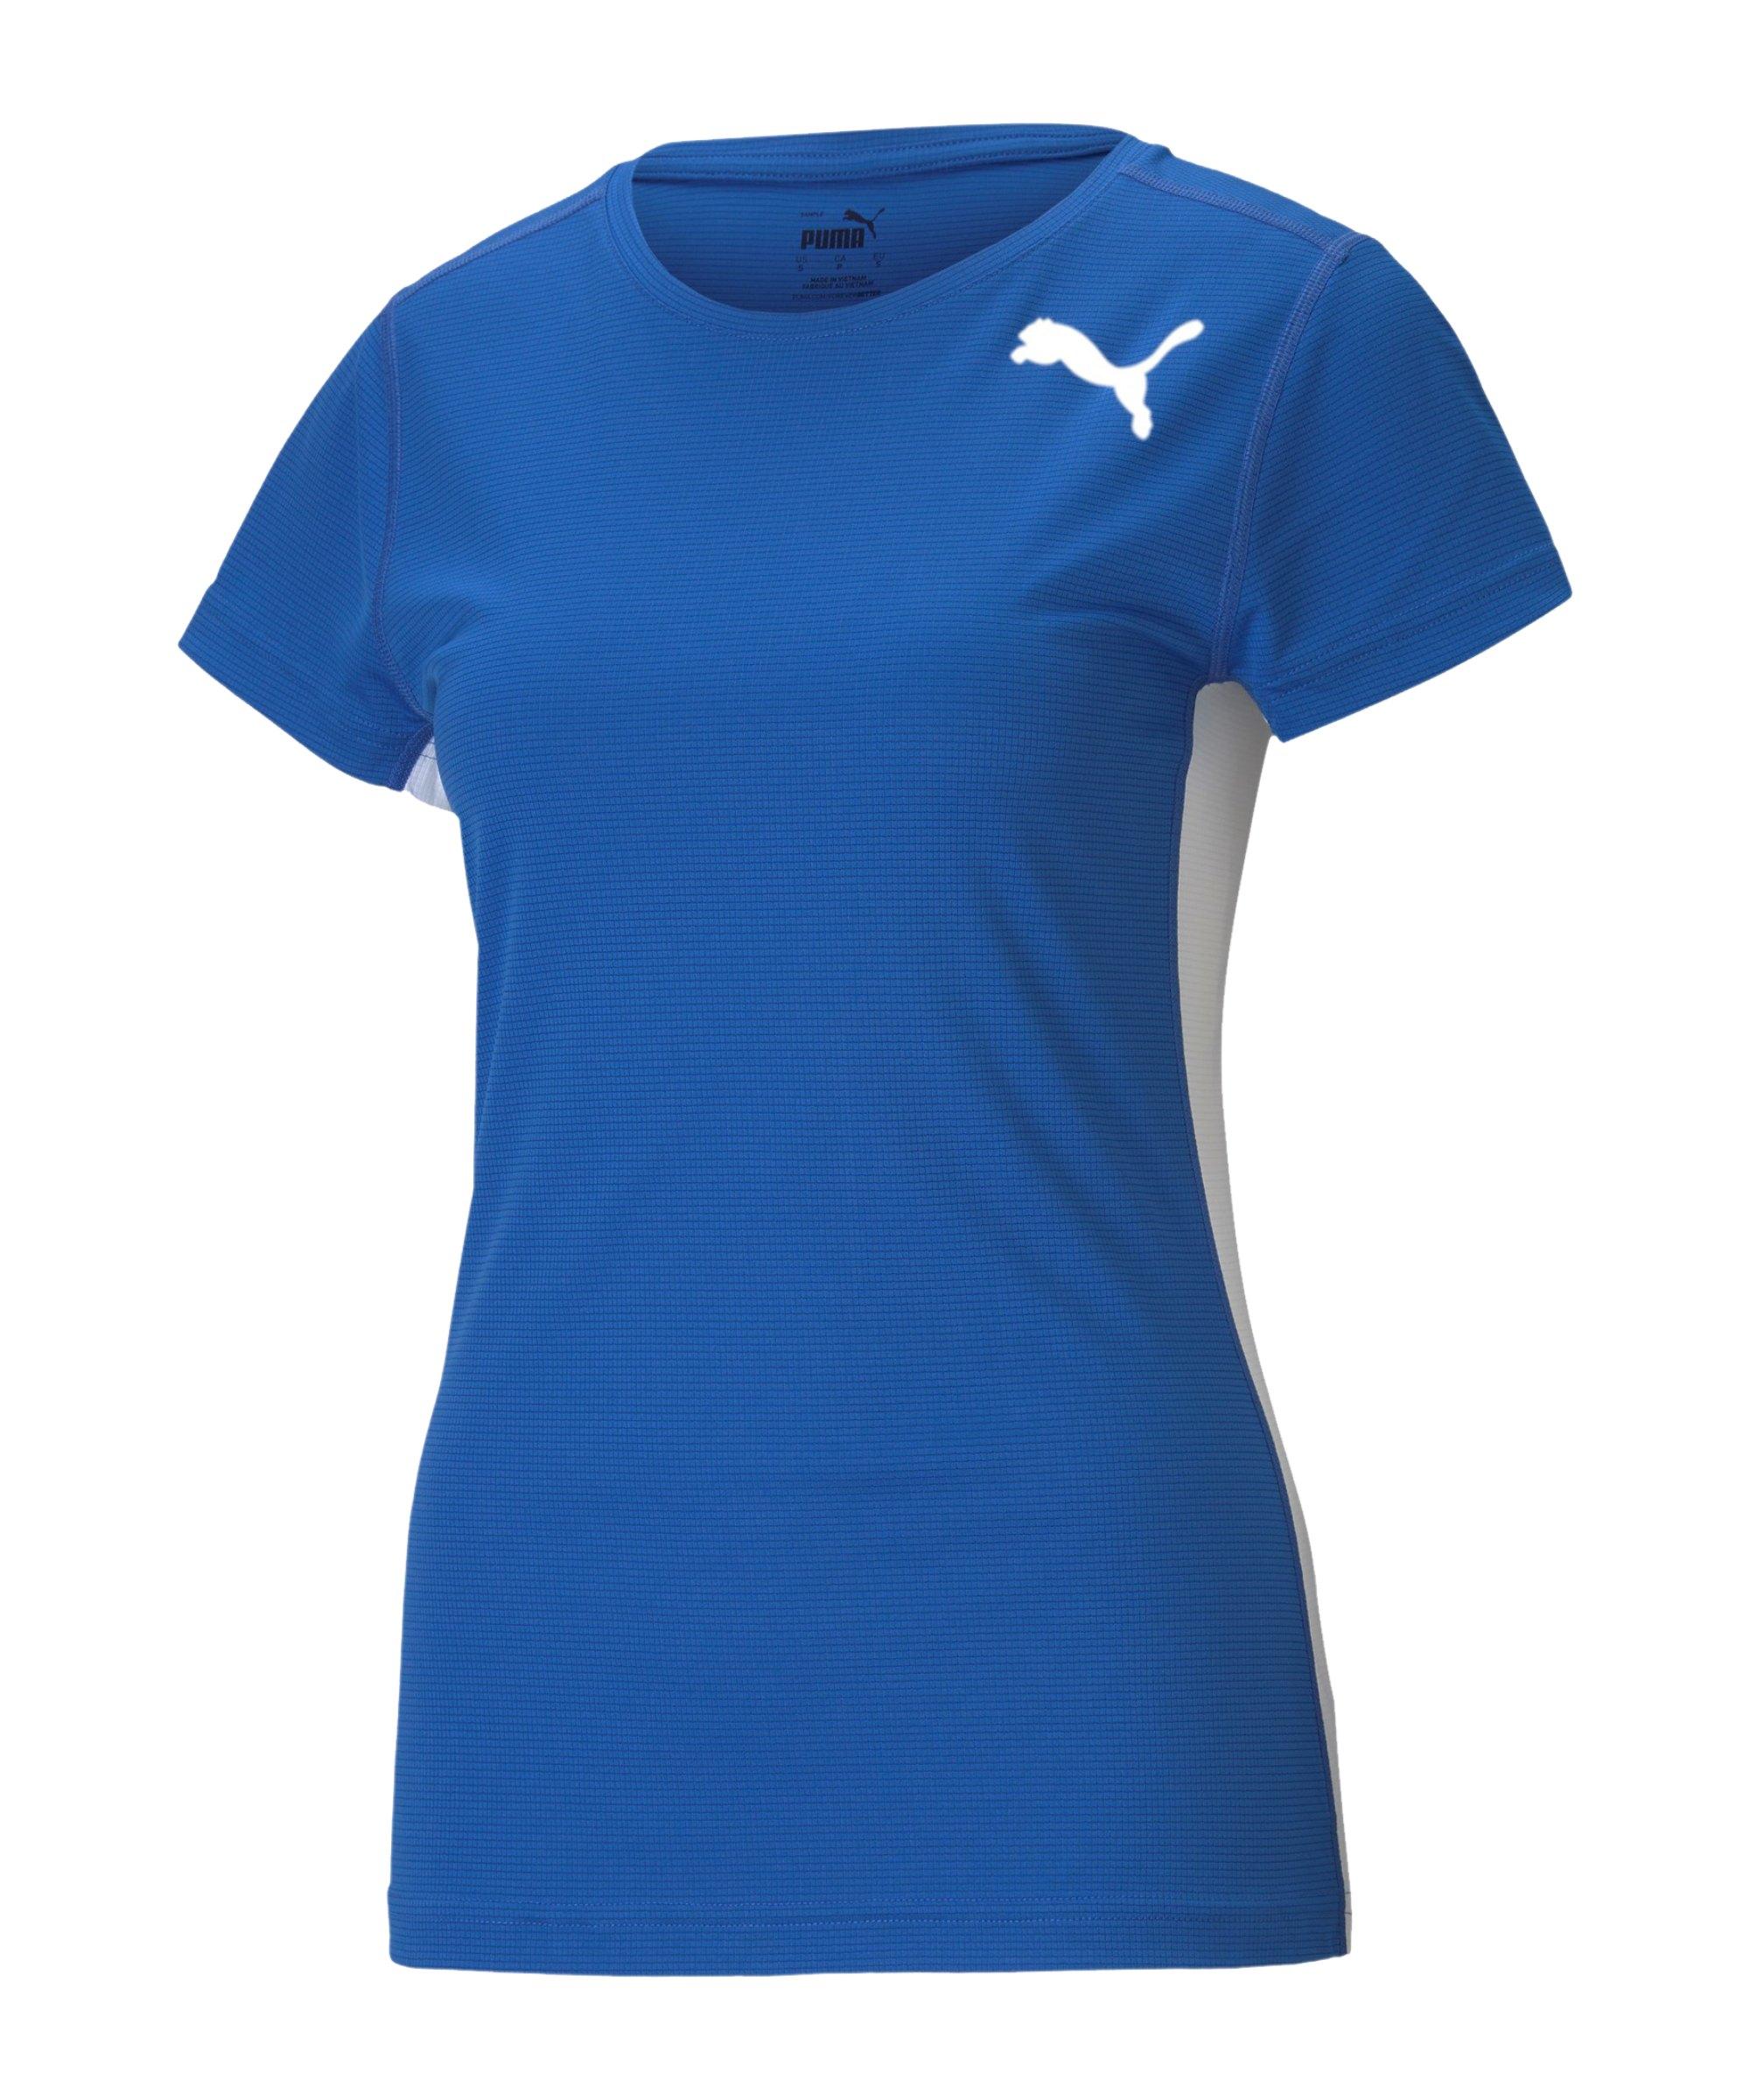 PUMA Cross the Line 2.0 T-Shirt Training Damen F04 - blau